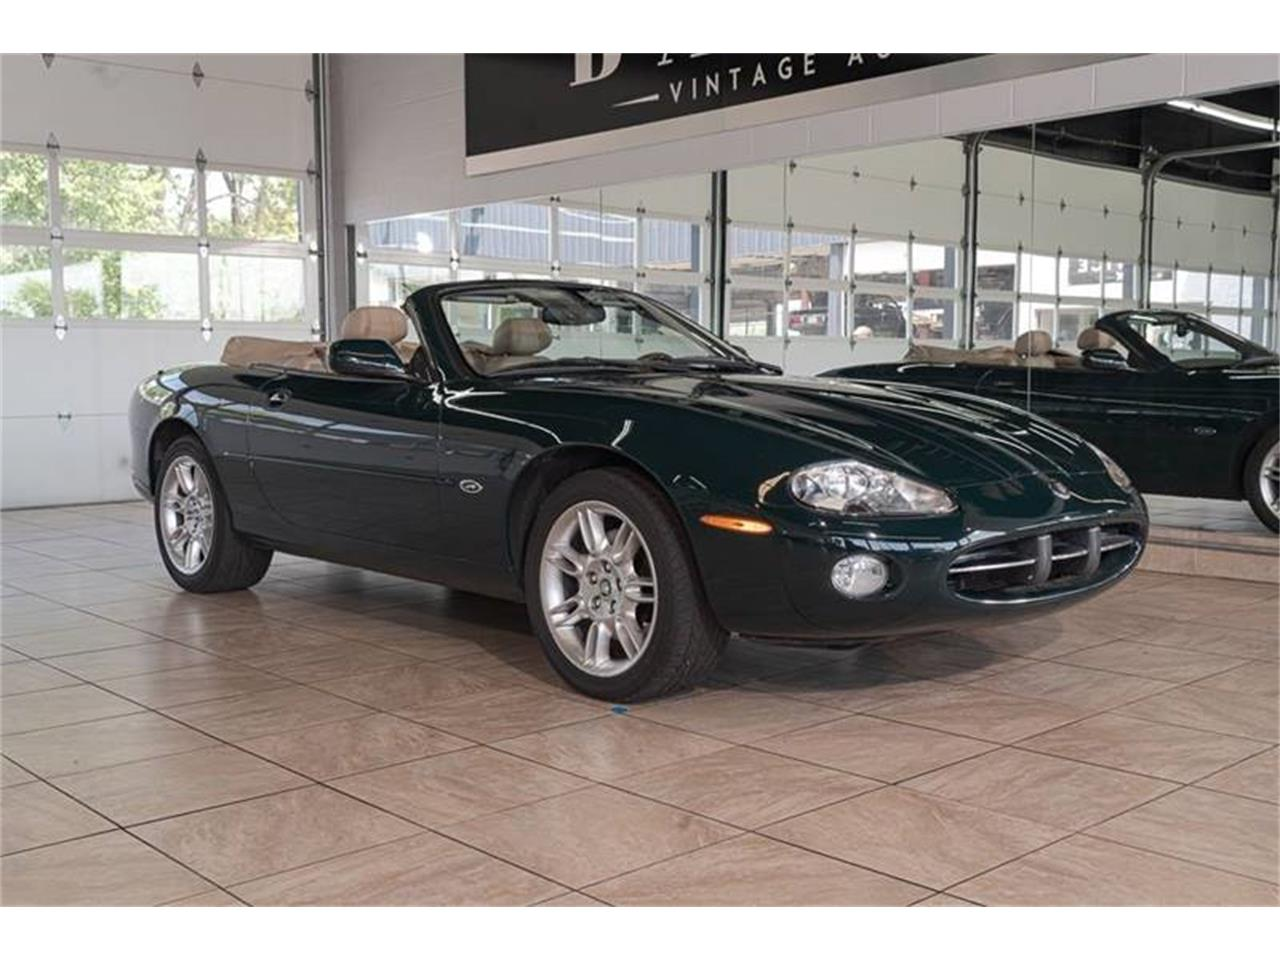 2001 Jaguar XK for sale in St. Charles, IL ...